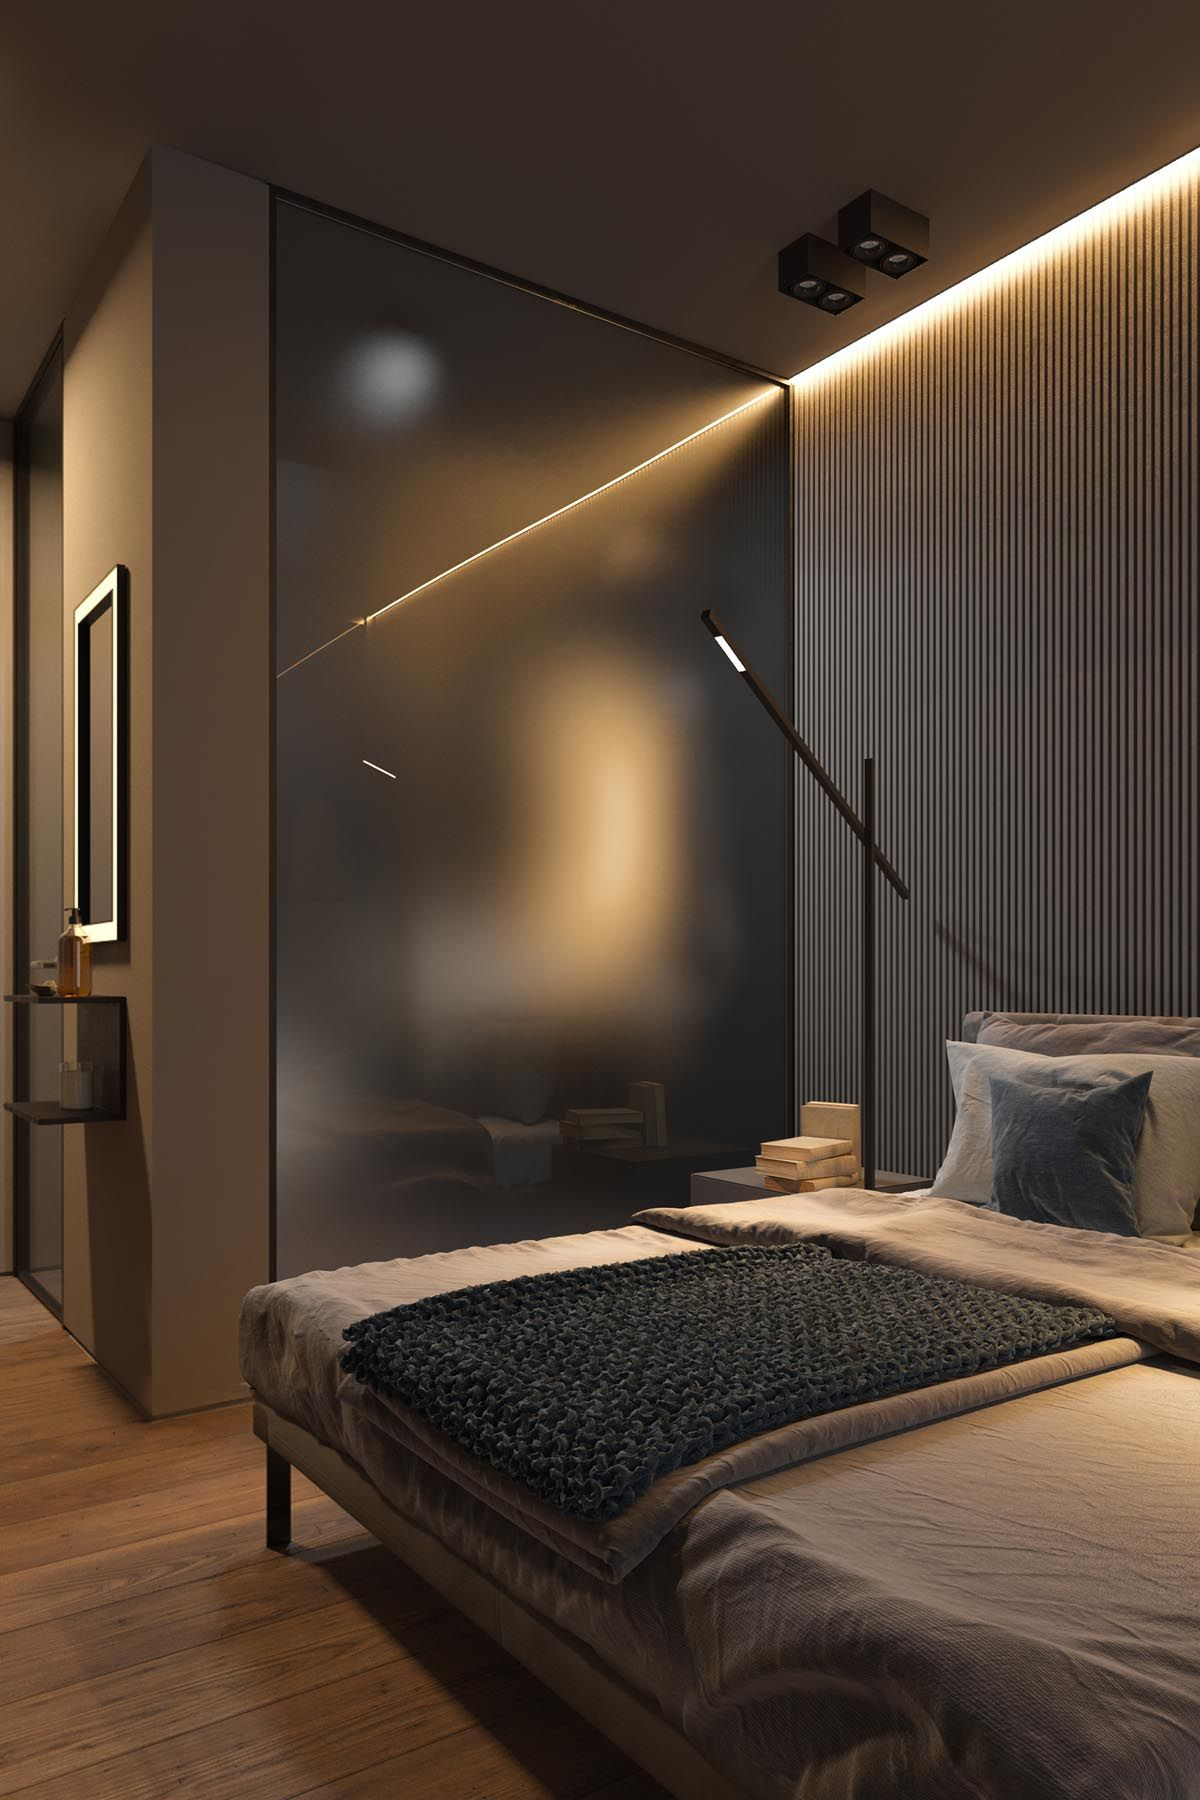 Dark Grey Home Decor With Warm Led Lighting Modern Bedroom Design Grey Home Decor Loft Interior Design